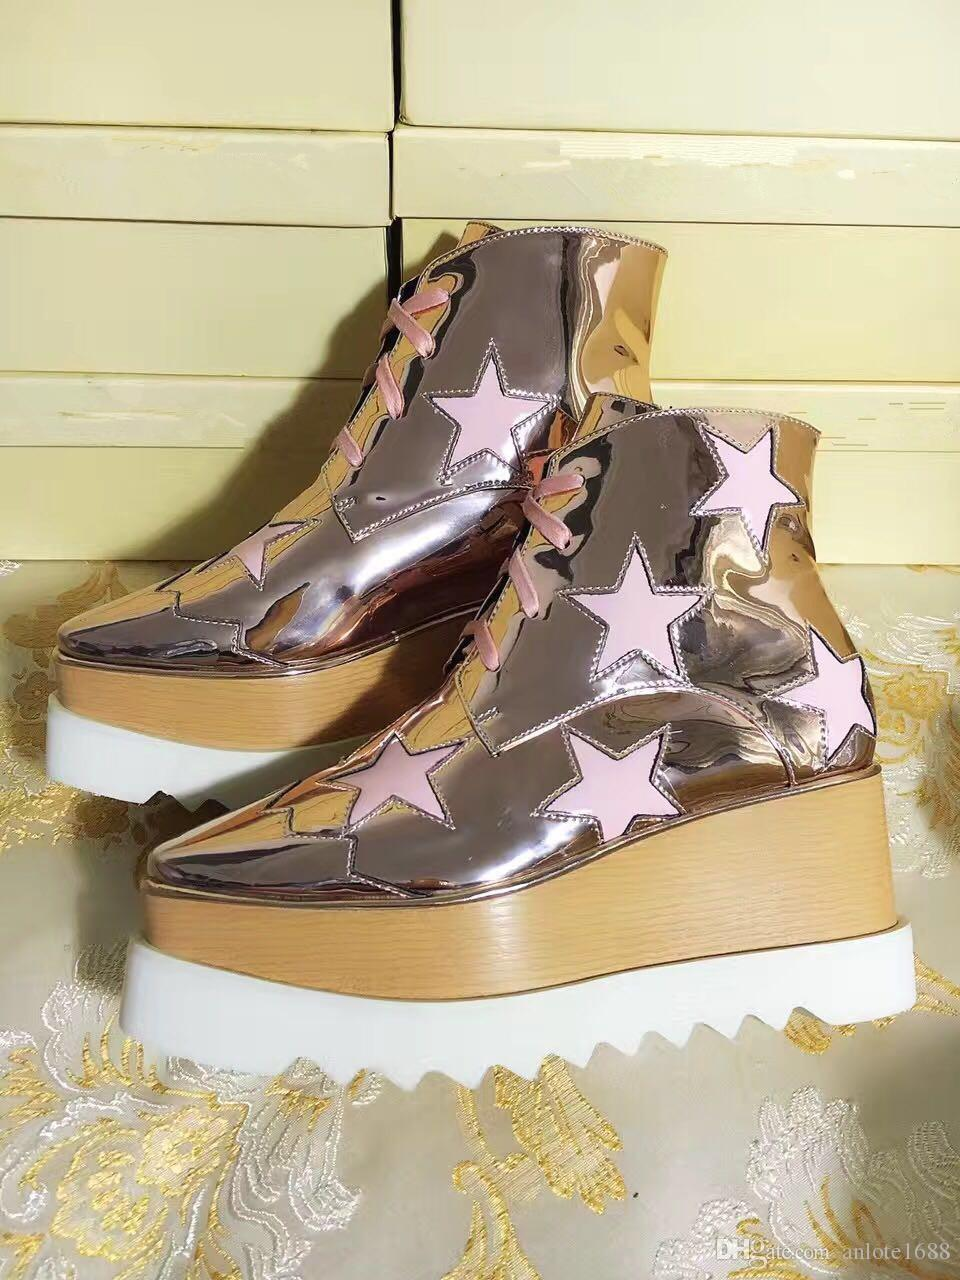 Femmes Bottines En Cuir Stella Mccartney Star Creepers Chaussures Or Rose Bretelles Compensées Plateforme Chaussures D'hiver Chaussures Espadrilles Boîte d'origine